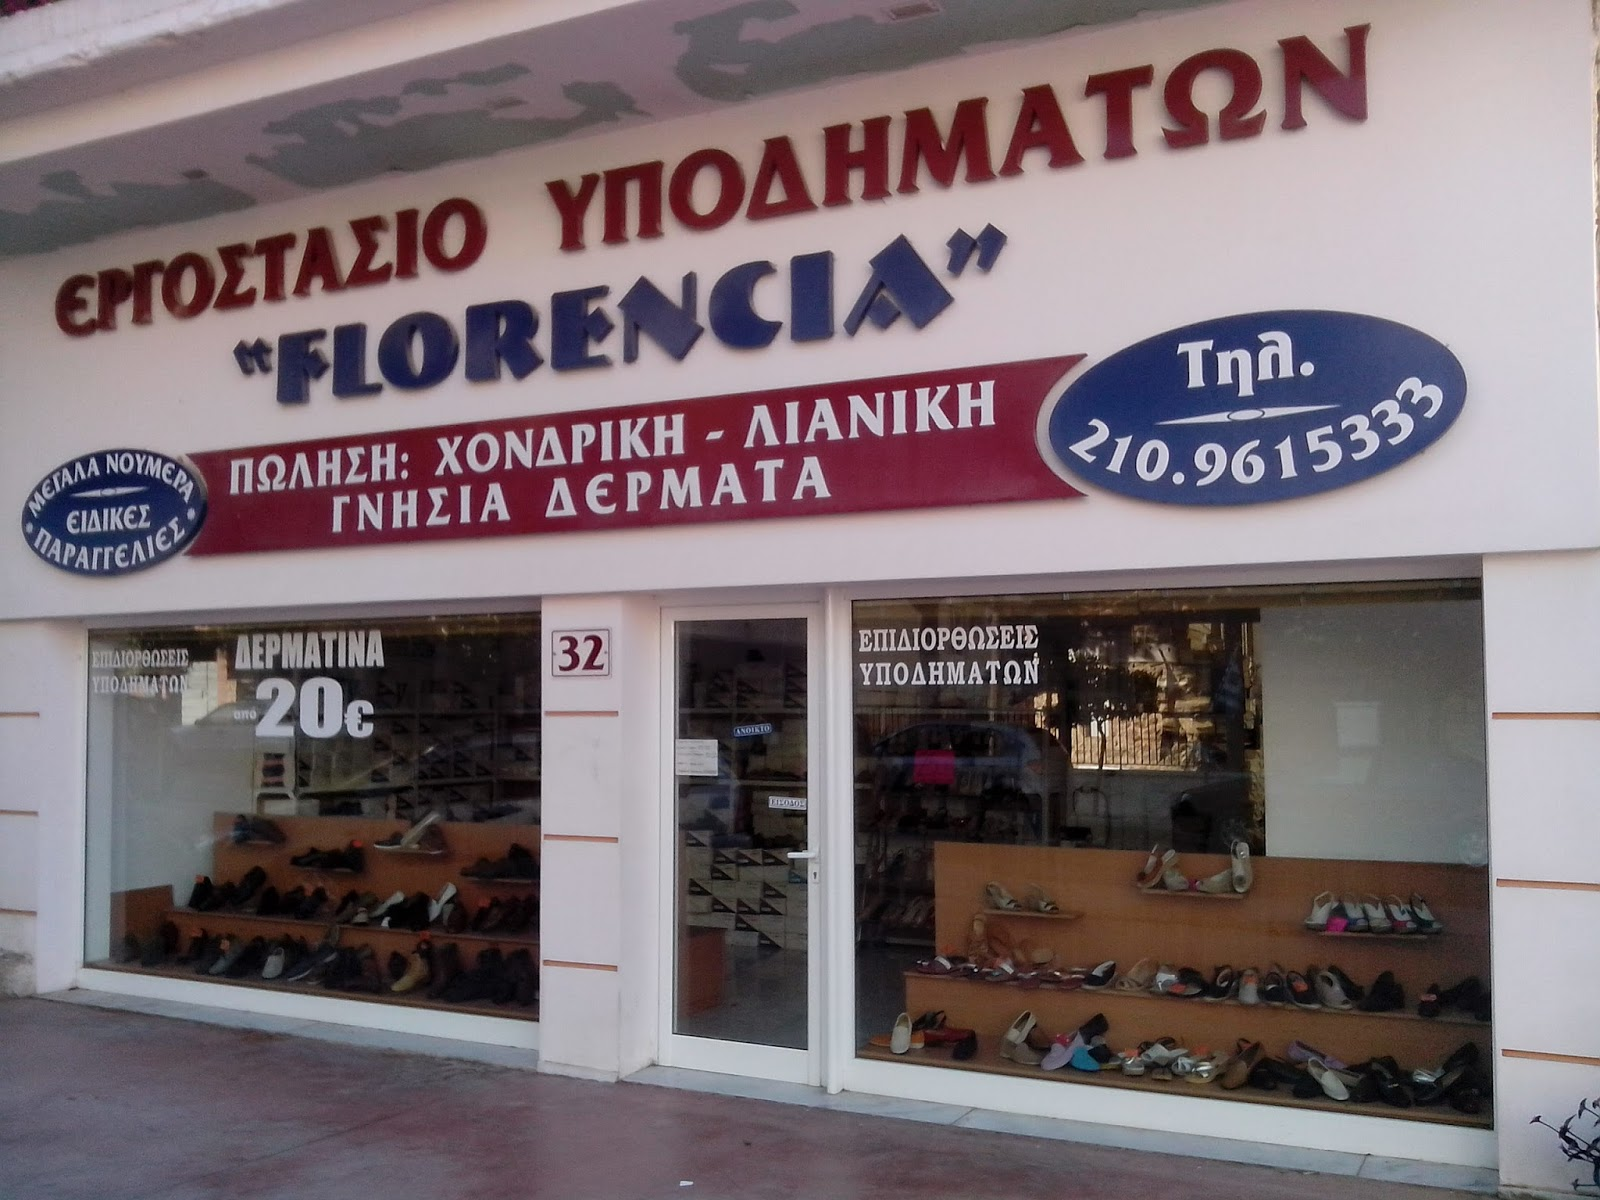 Florencia Δερμάτινα Παπούτσια Γλυφάδα σε Γλυφάδα - Γενικά ... 12c12bb3d5d